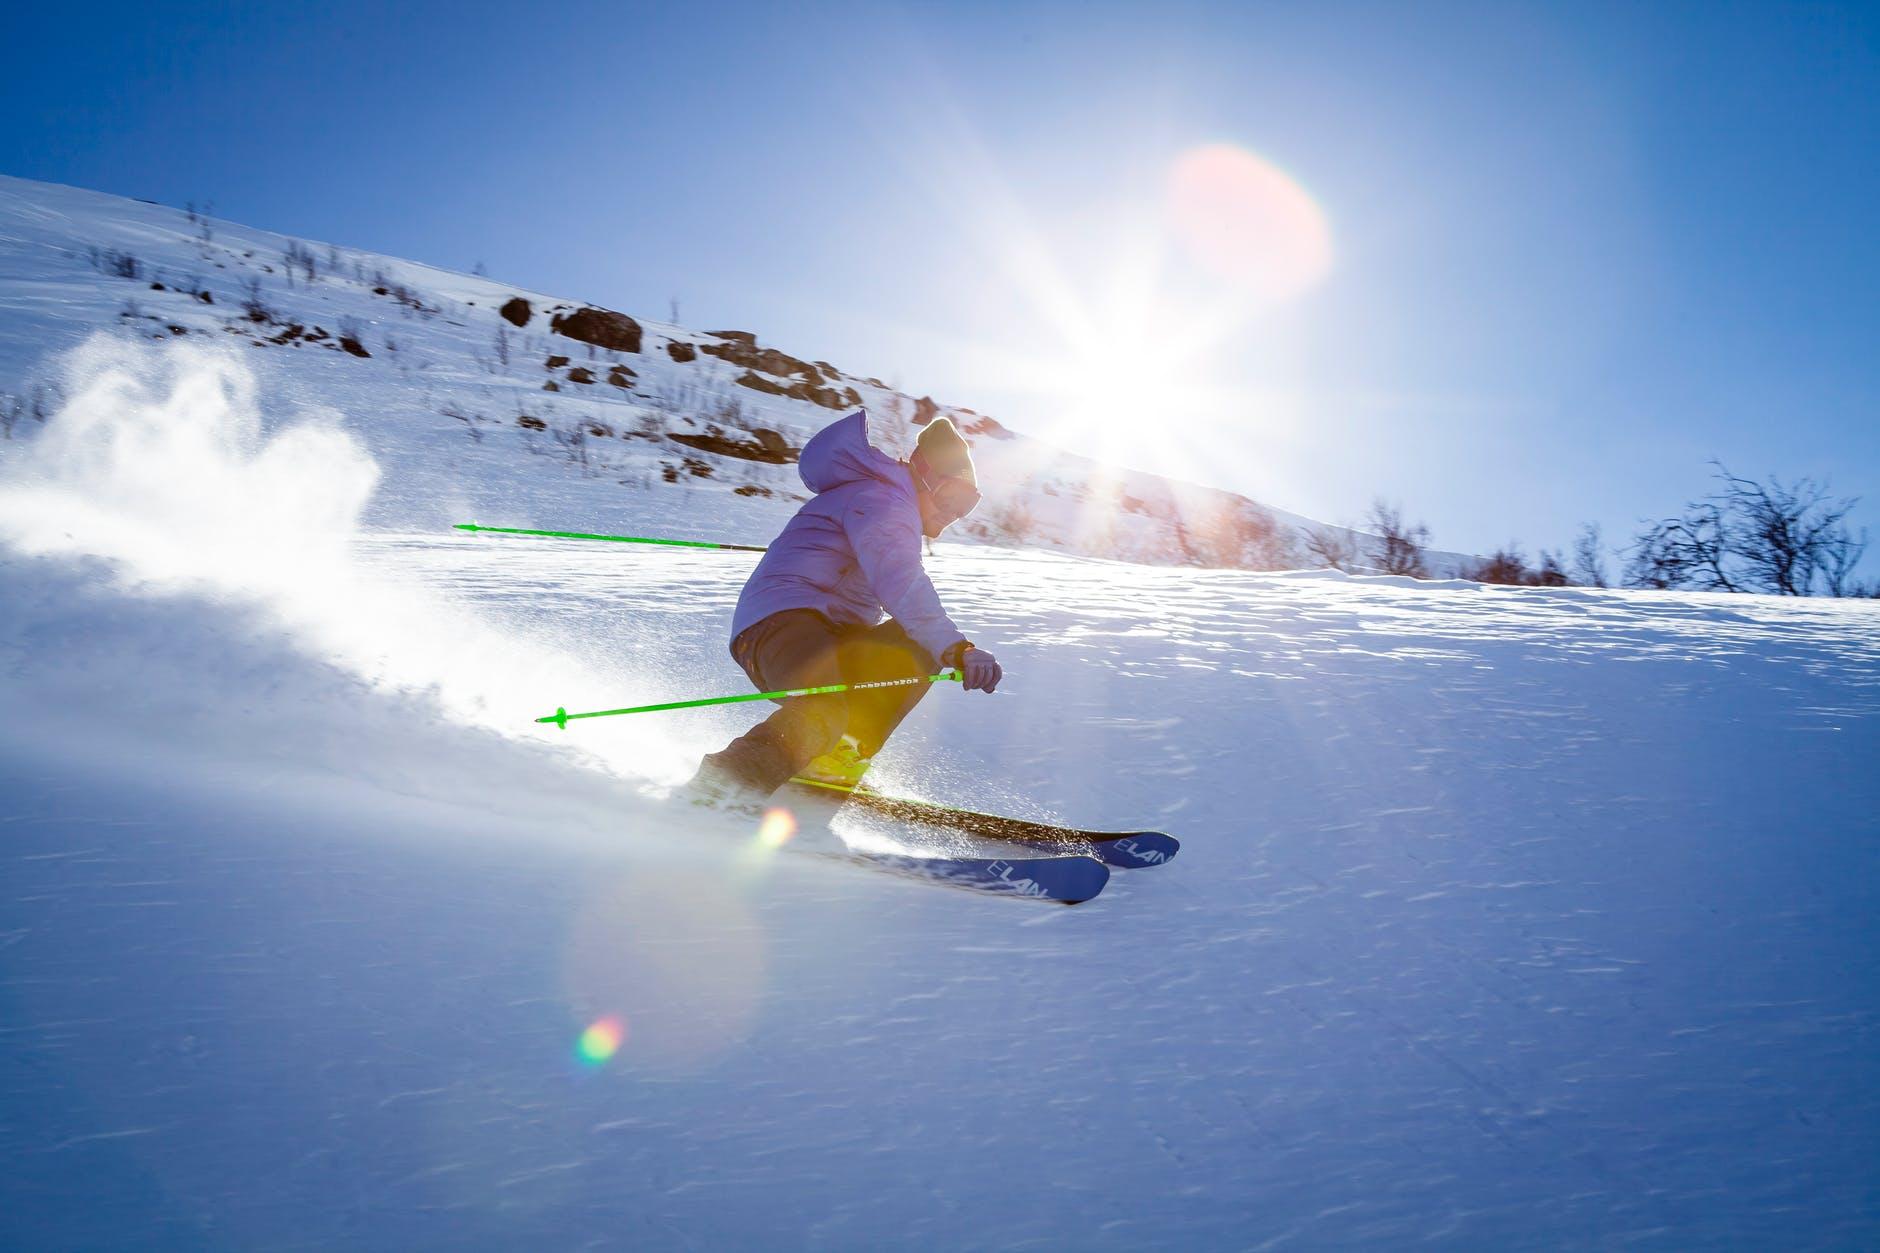 action adult adventure alpine